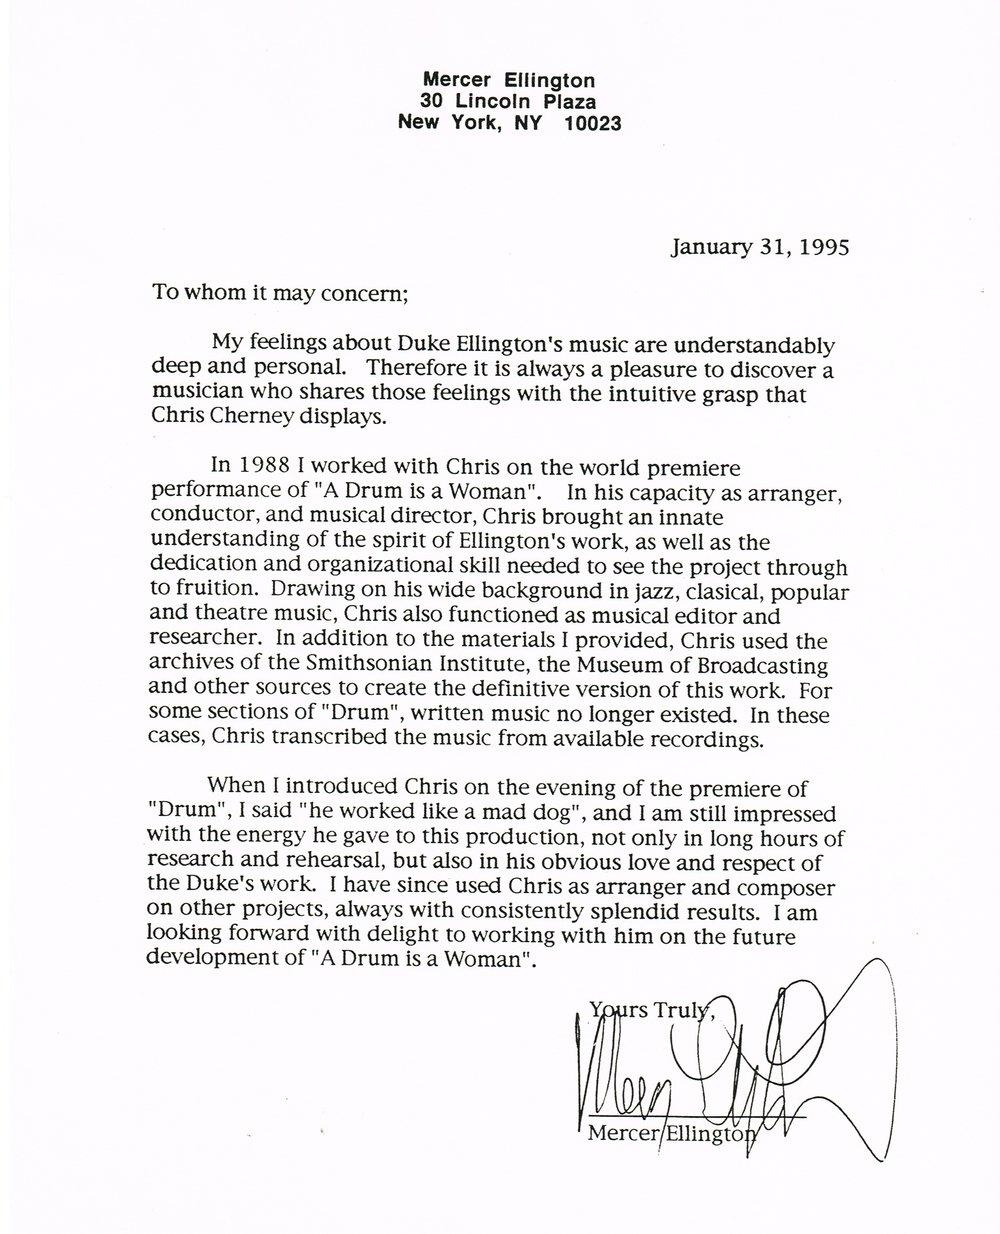 Mercer Ellington letter of recommendation for CC.jpeg